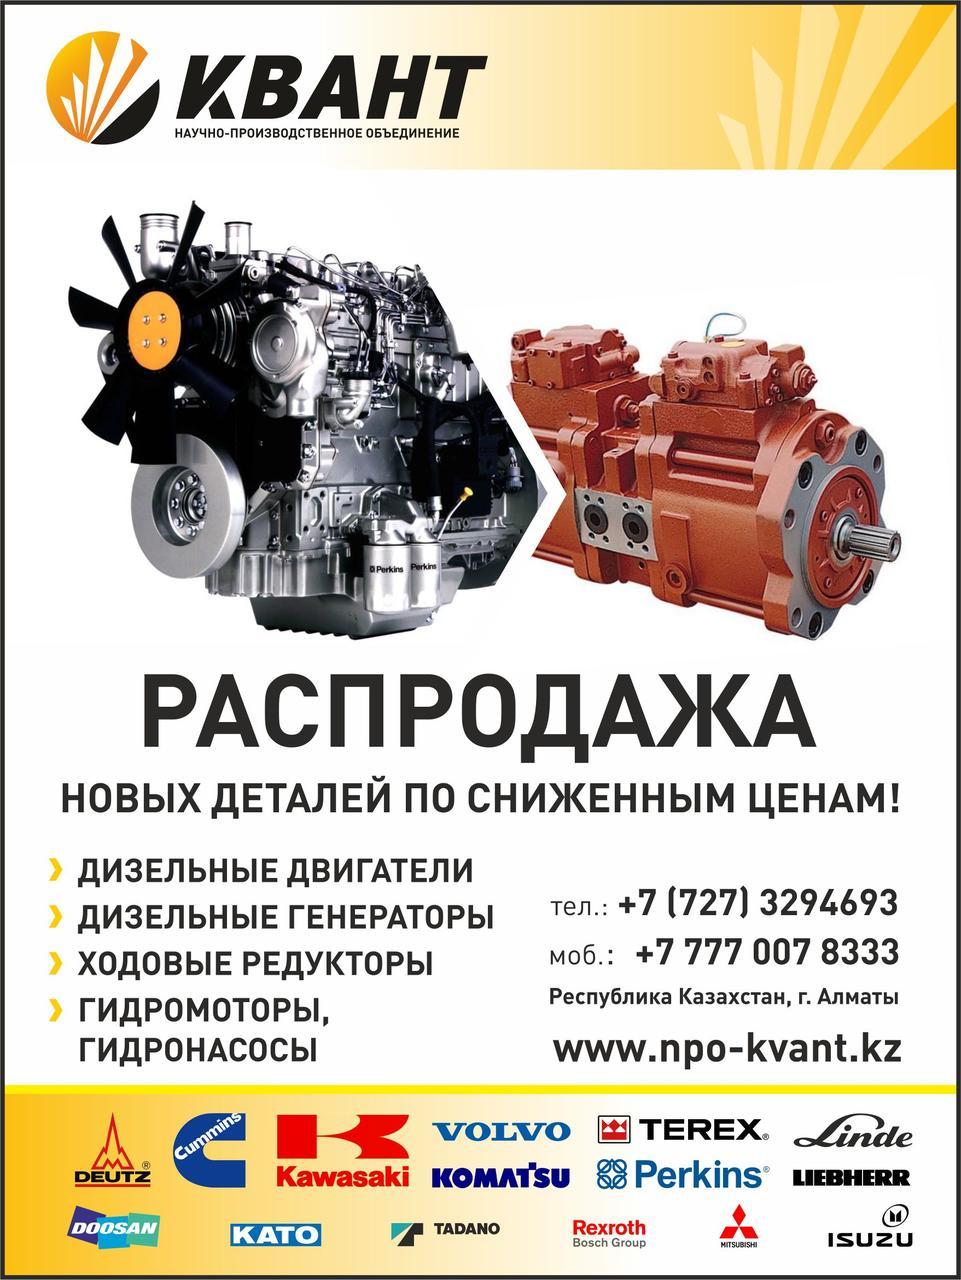 Двигатель Komatsu SAA6D125E-2, Komatsu SA6D140-2, Komatsu SA6D140E-3, Komatsu SA6D140-1